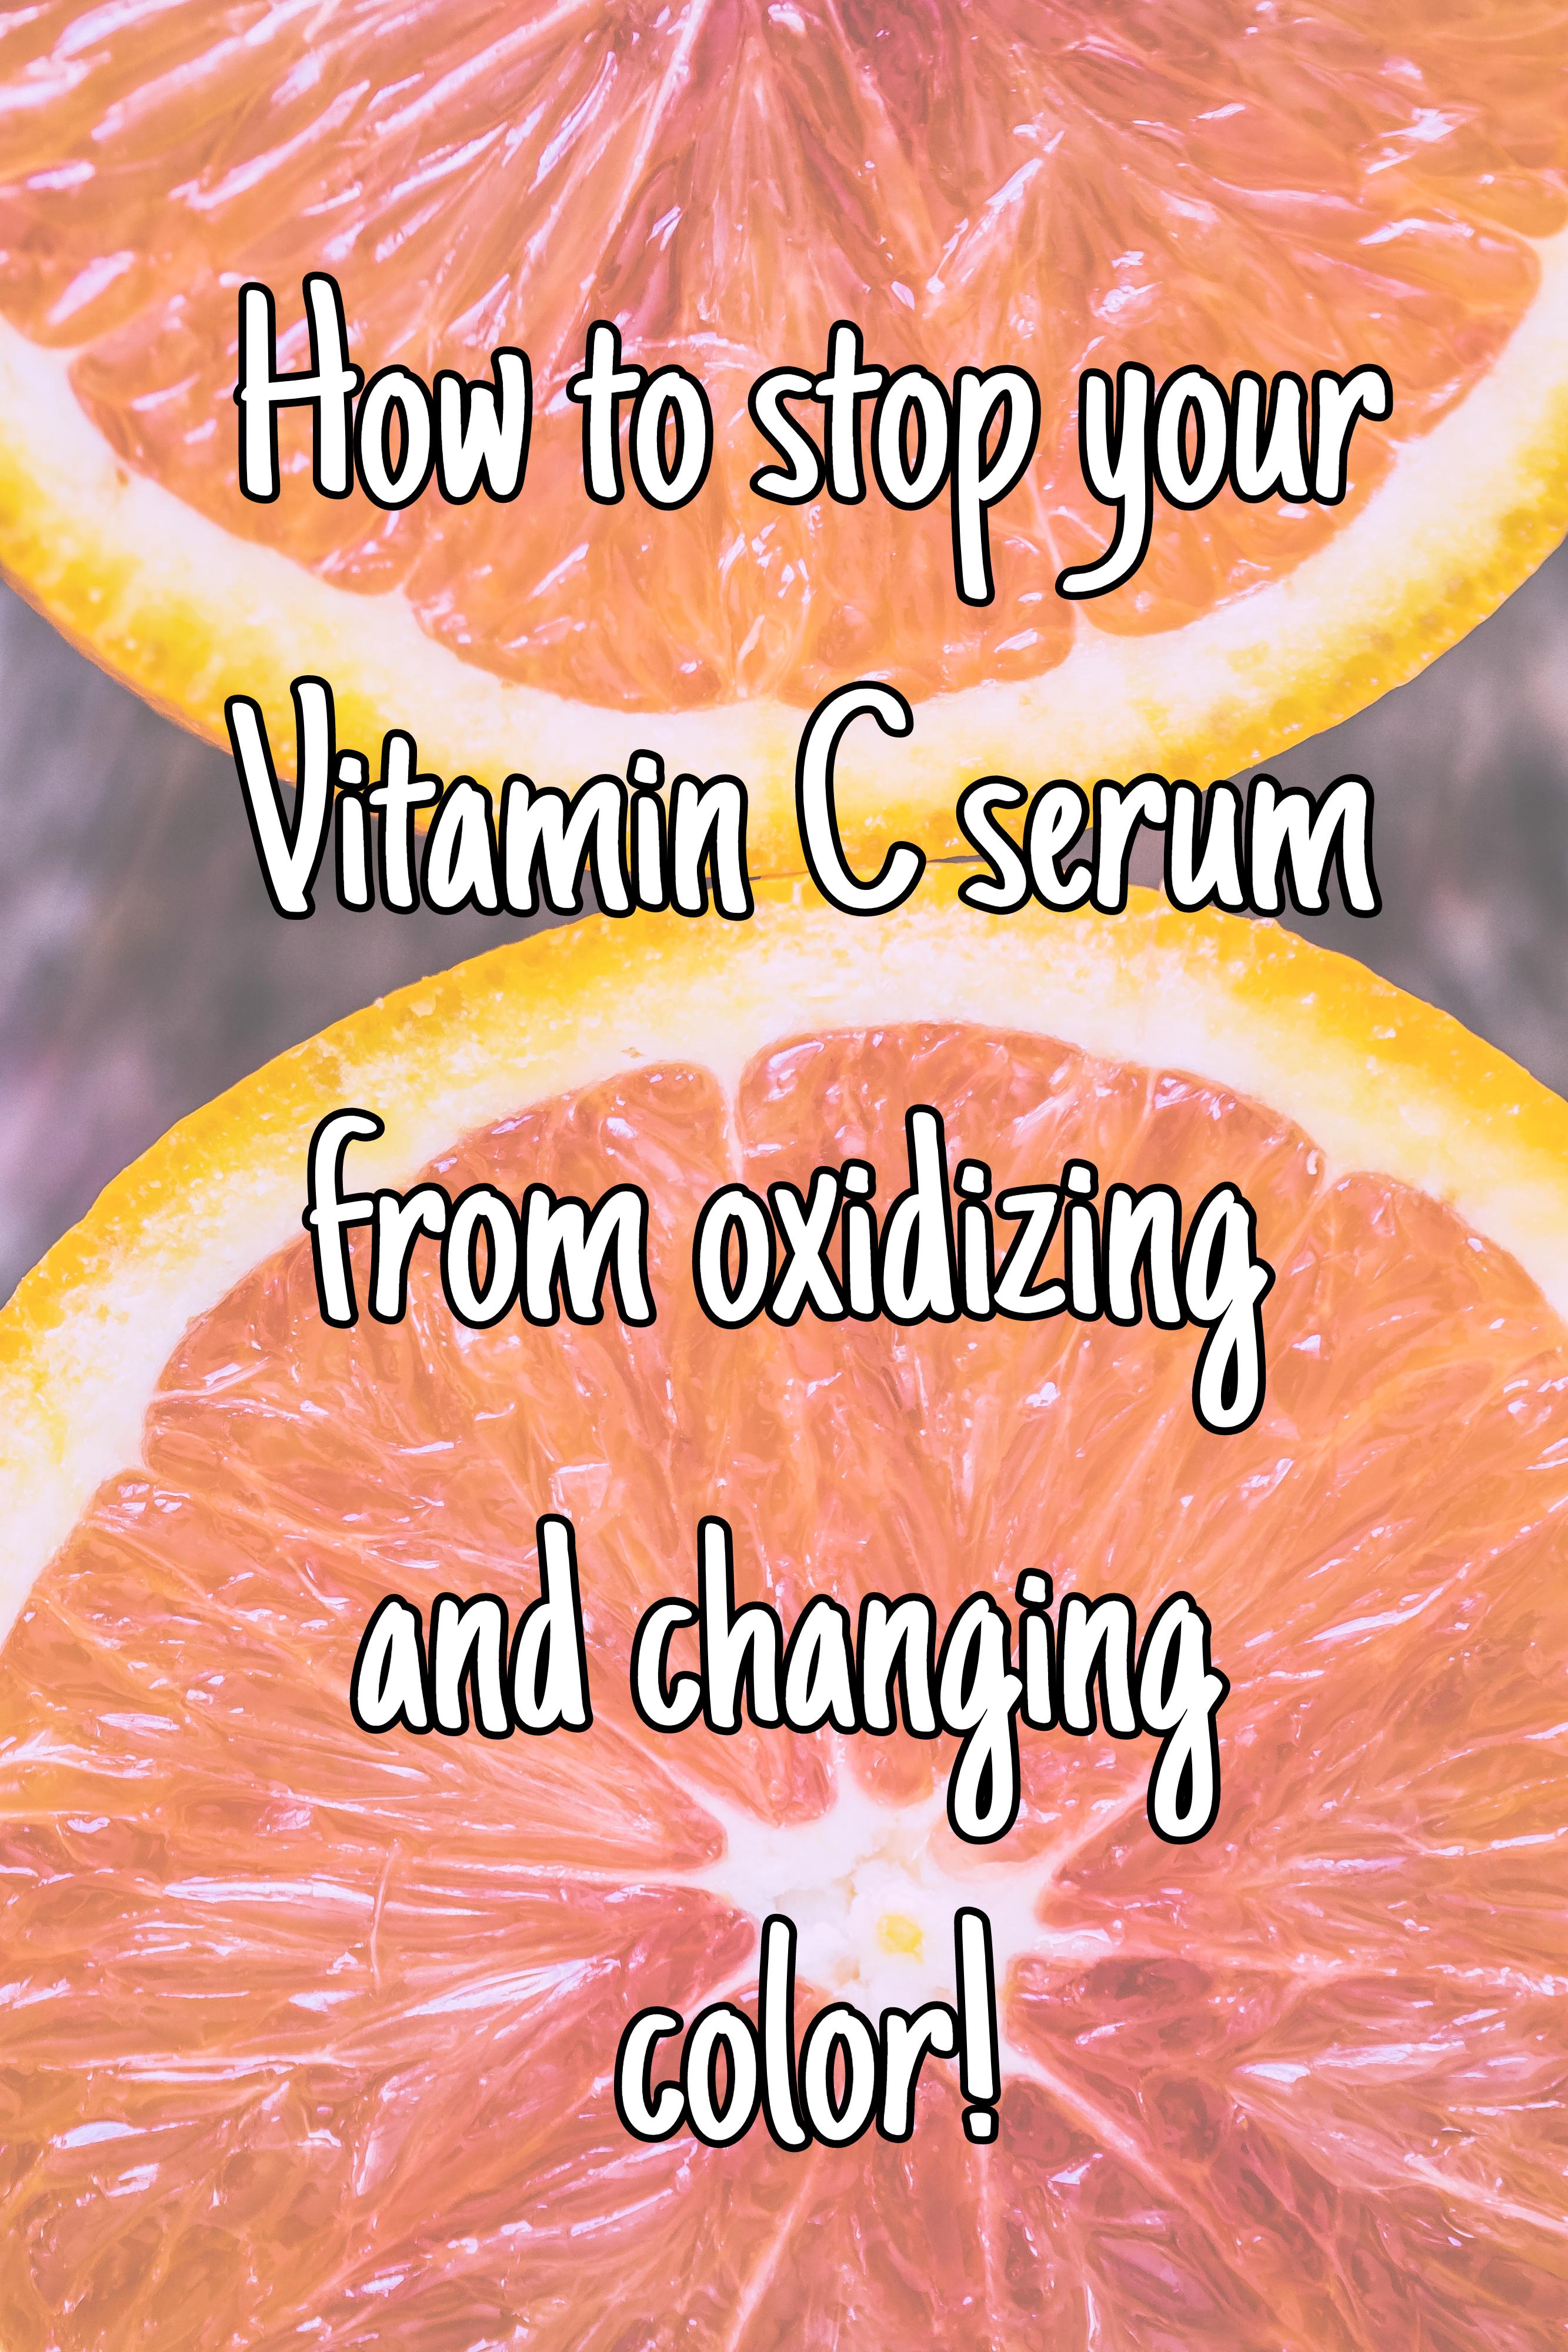 Stop Vitamin C serum from oxidizing!